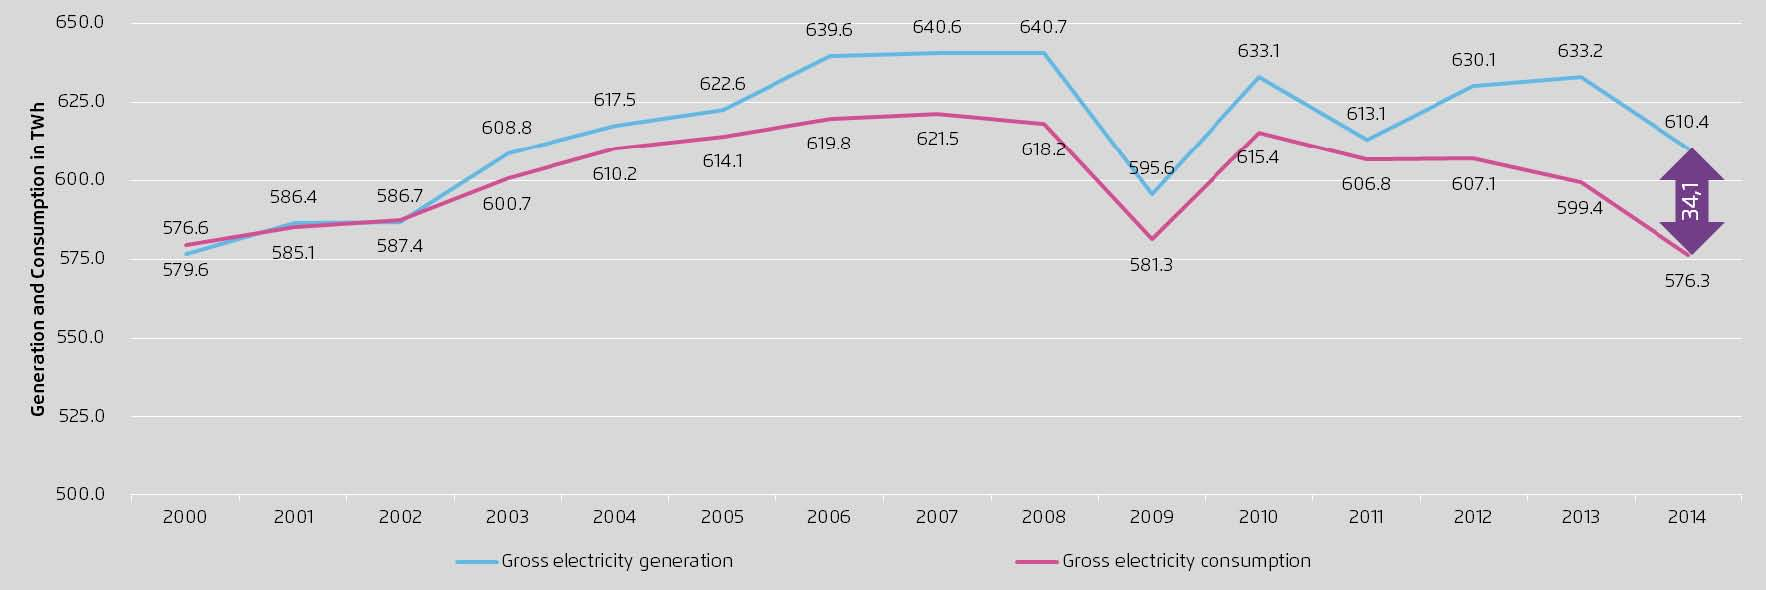 Proizvodnja i potrošnja el en u Njem 2000-2014